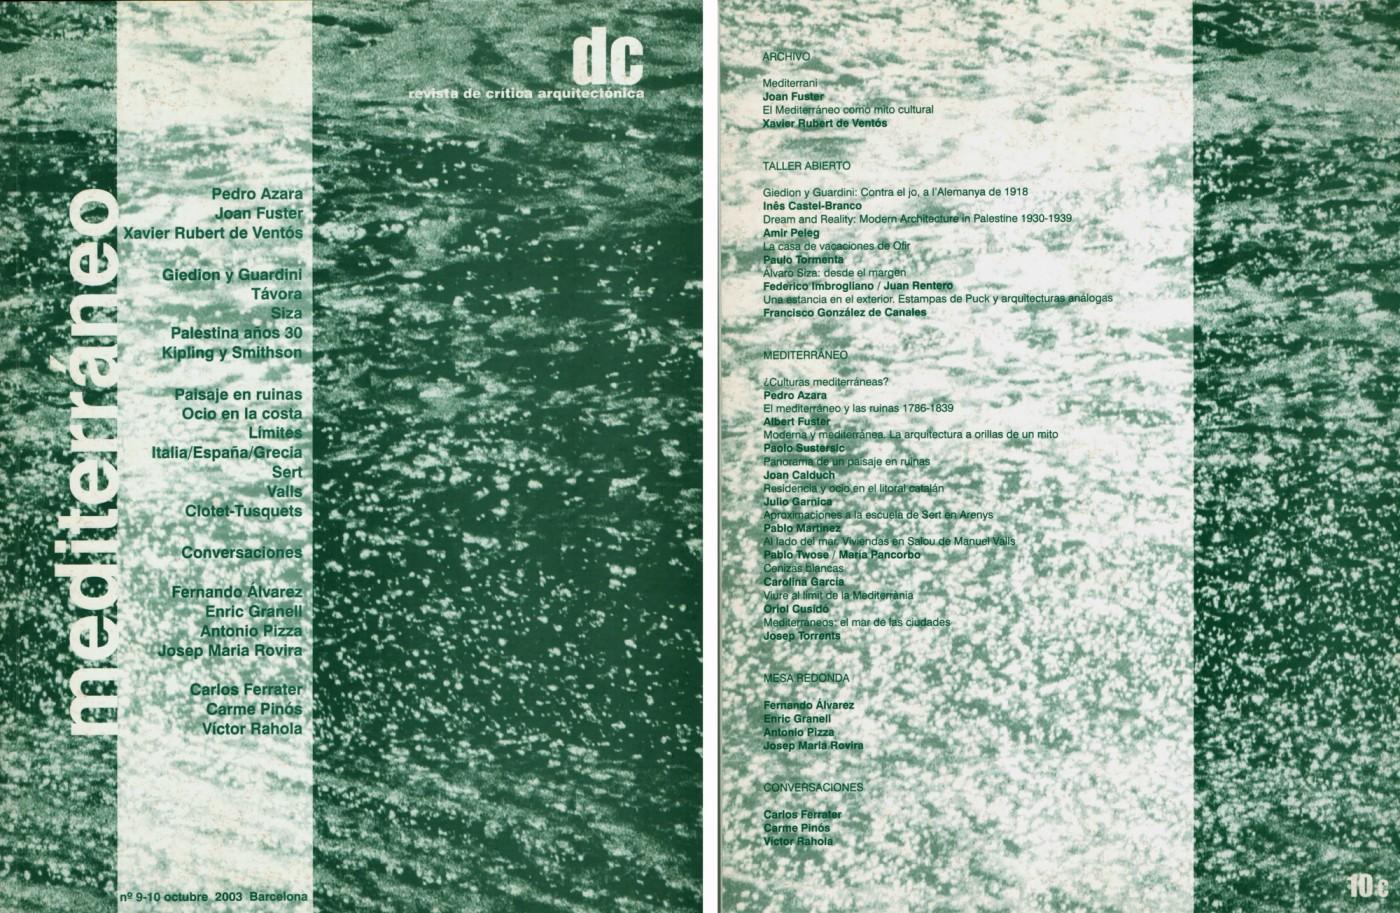 'DC revista de crítica arquitectònica', n.9-10